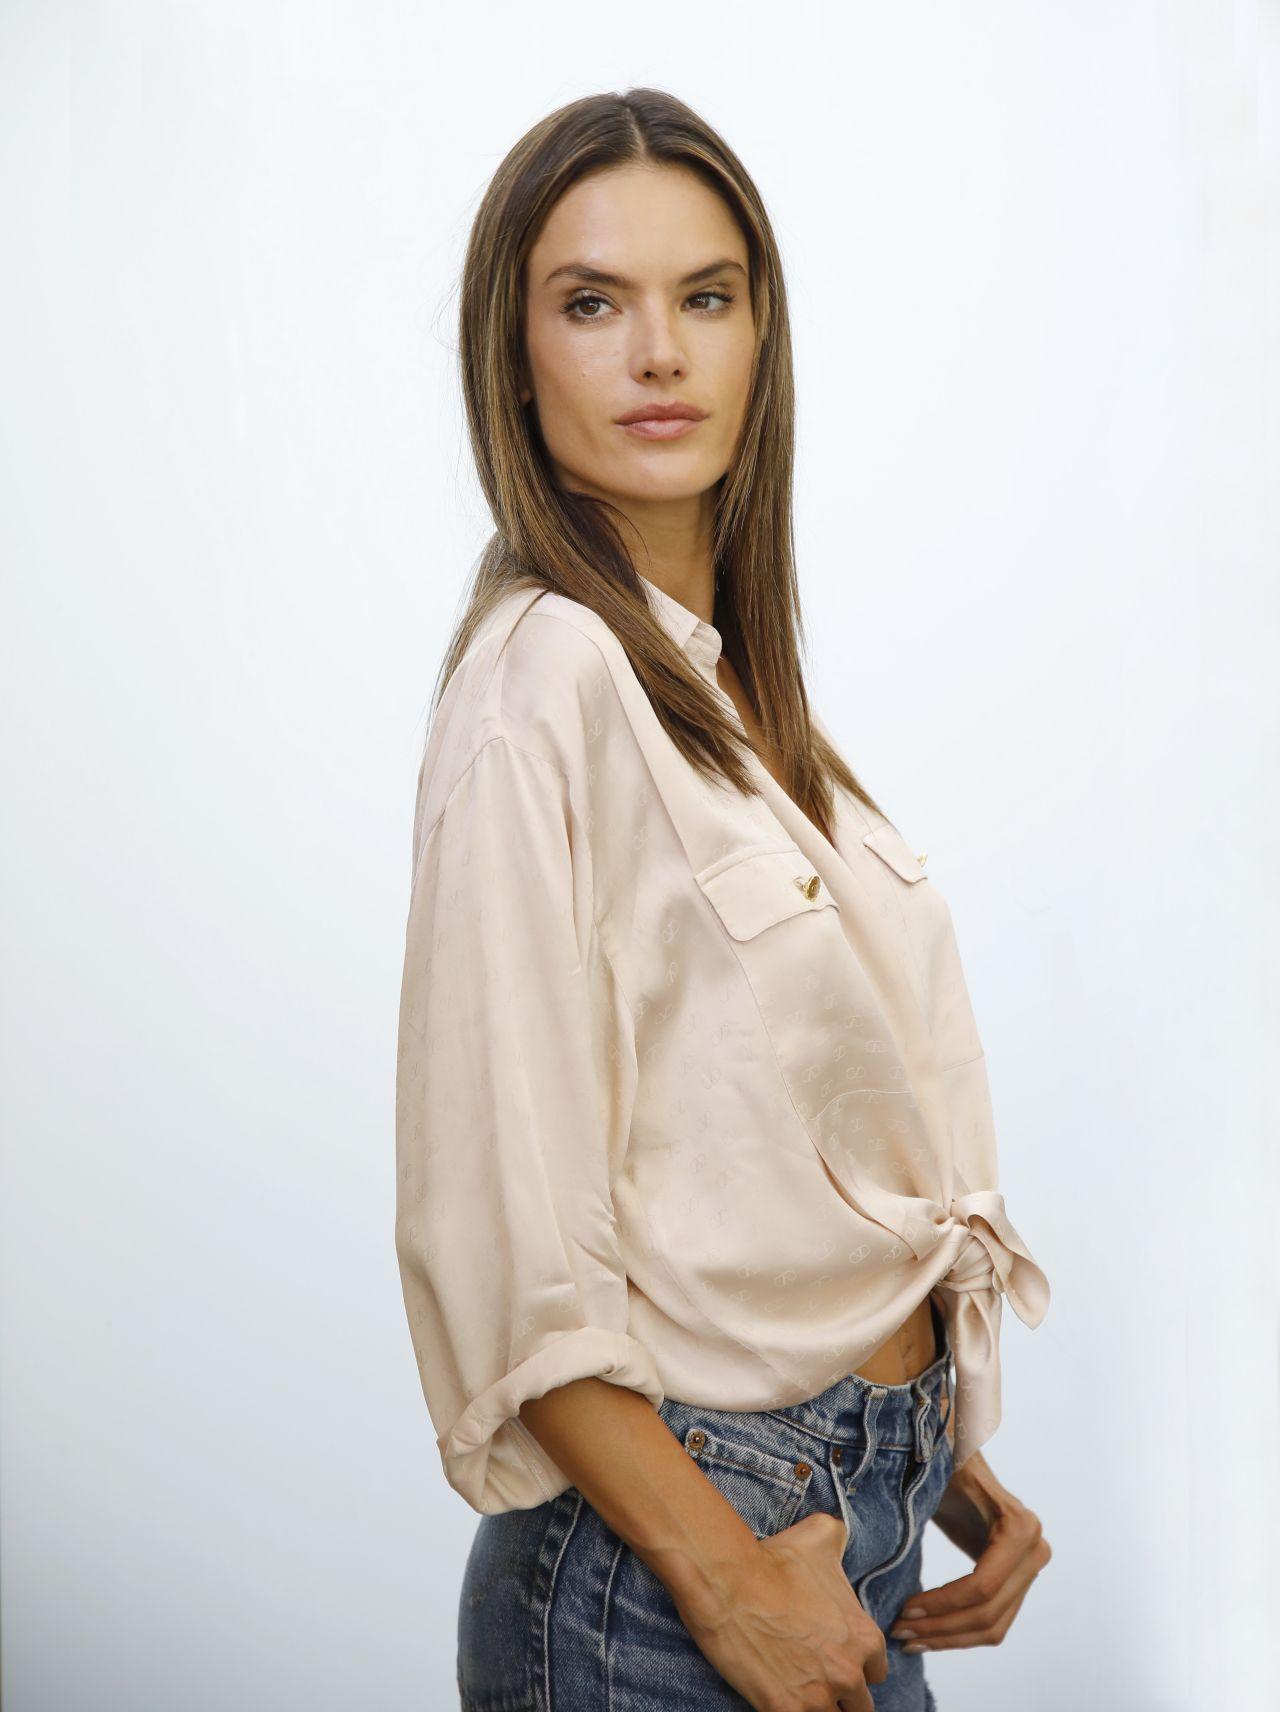 Alessandra Ambrosio Zuhair Murad Couture Fashion Show